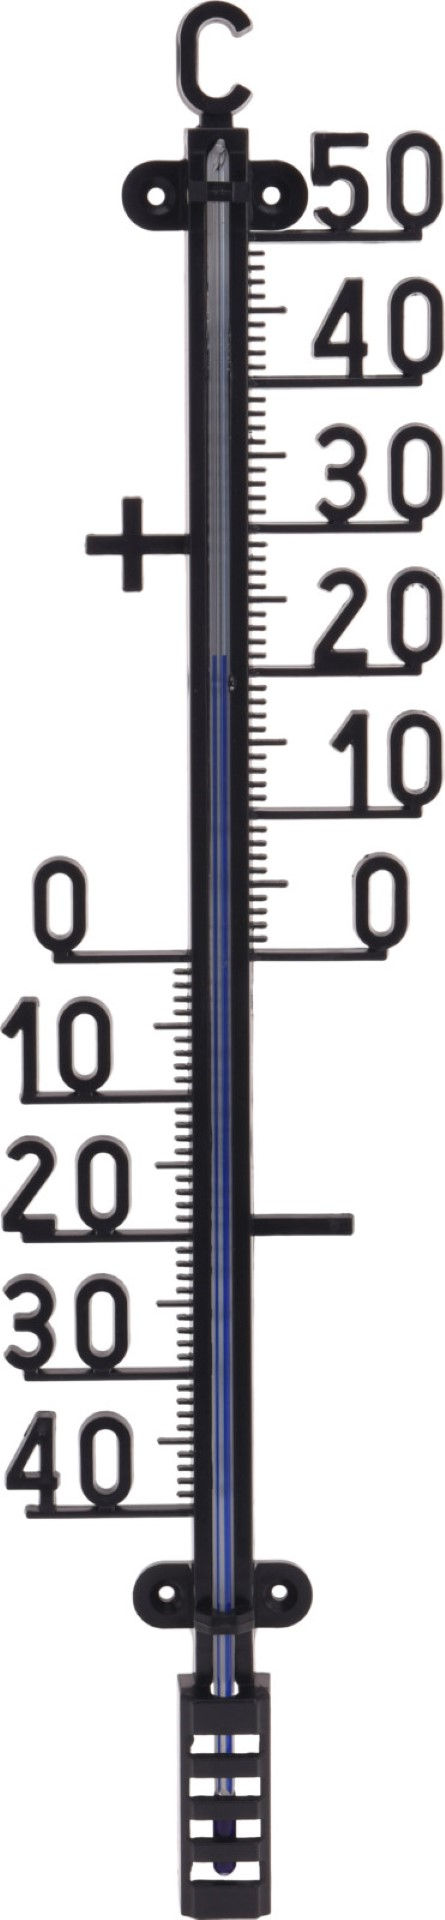 Thermometer 41x10cm zwart